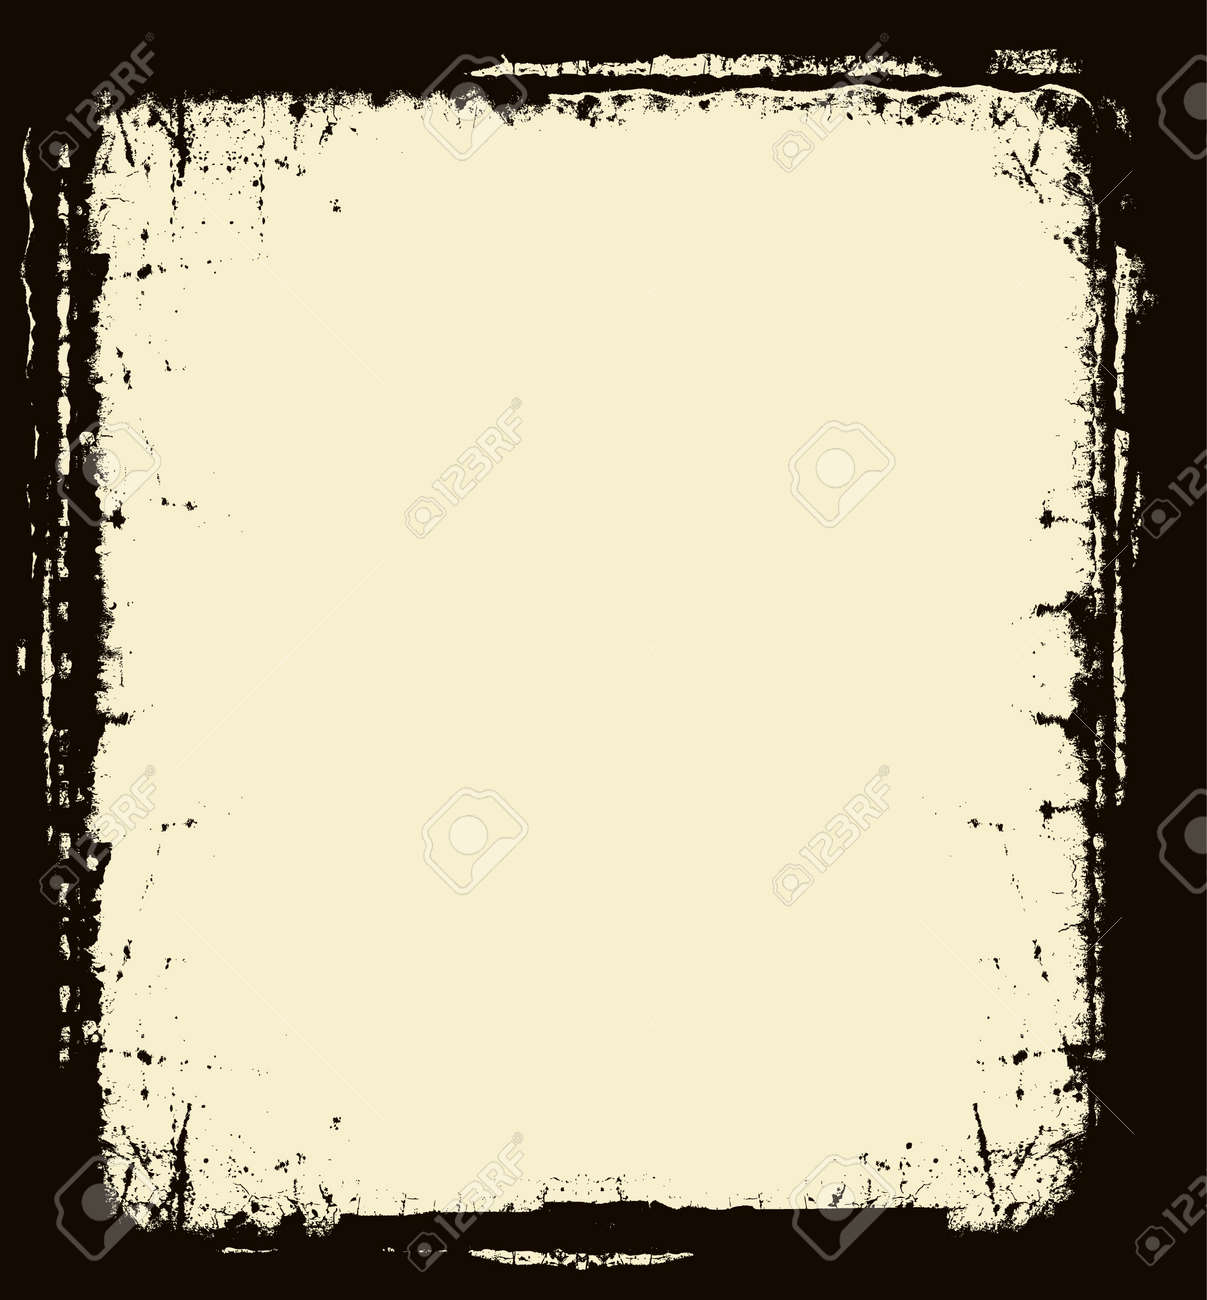 editable distressed dark border royalty free cliparts vectors and